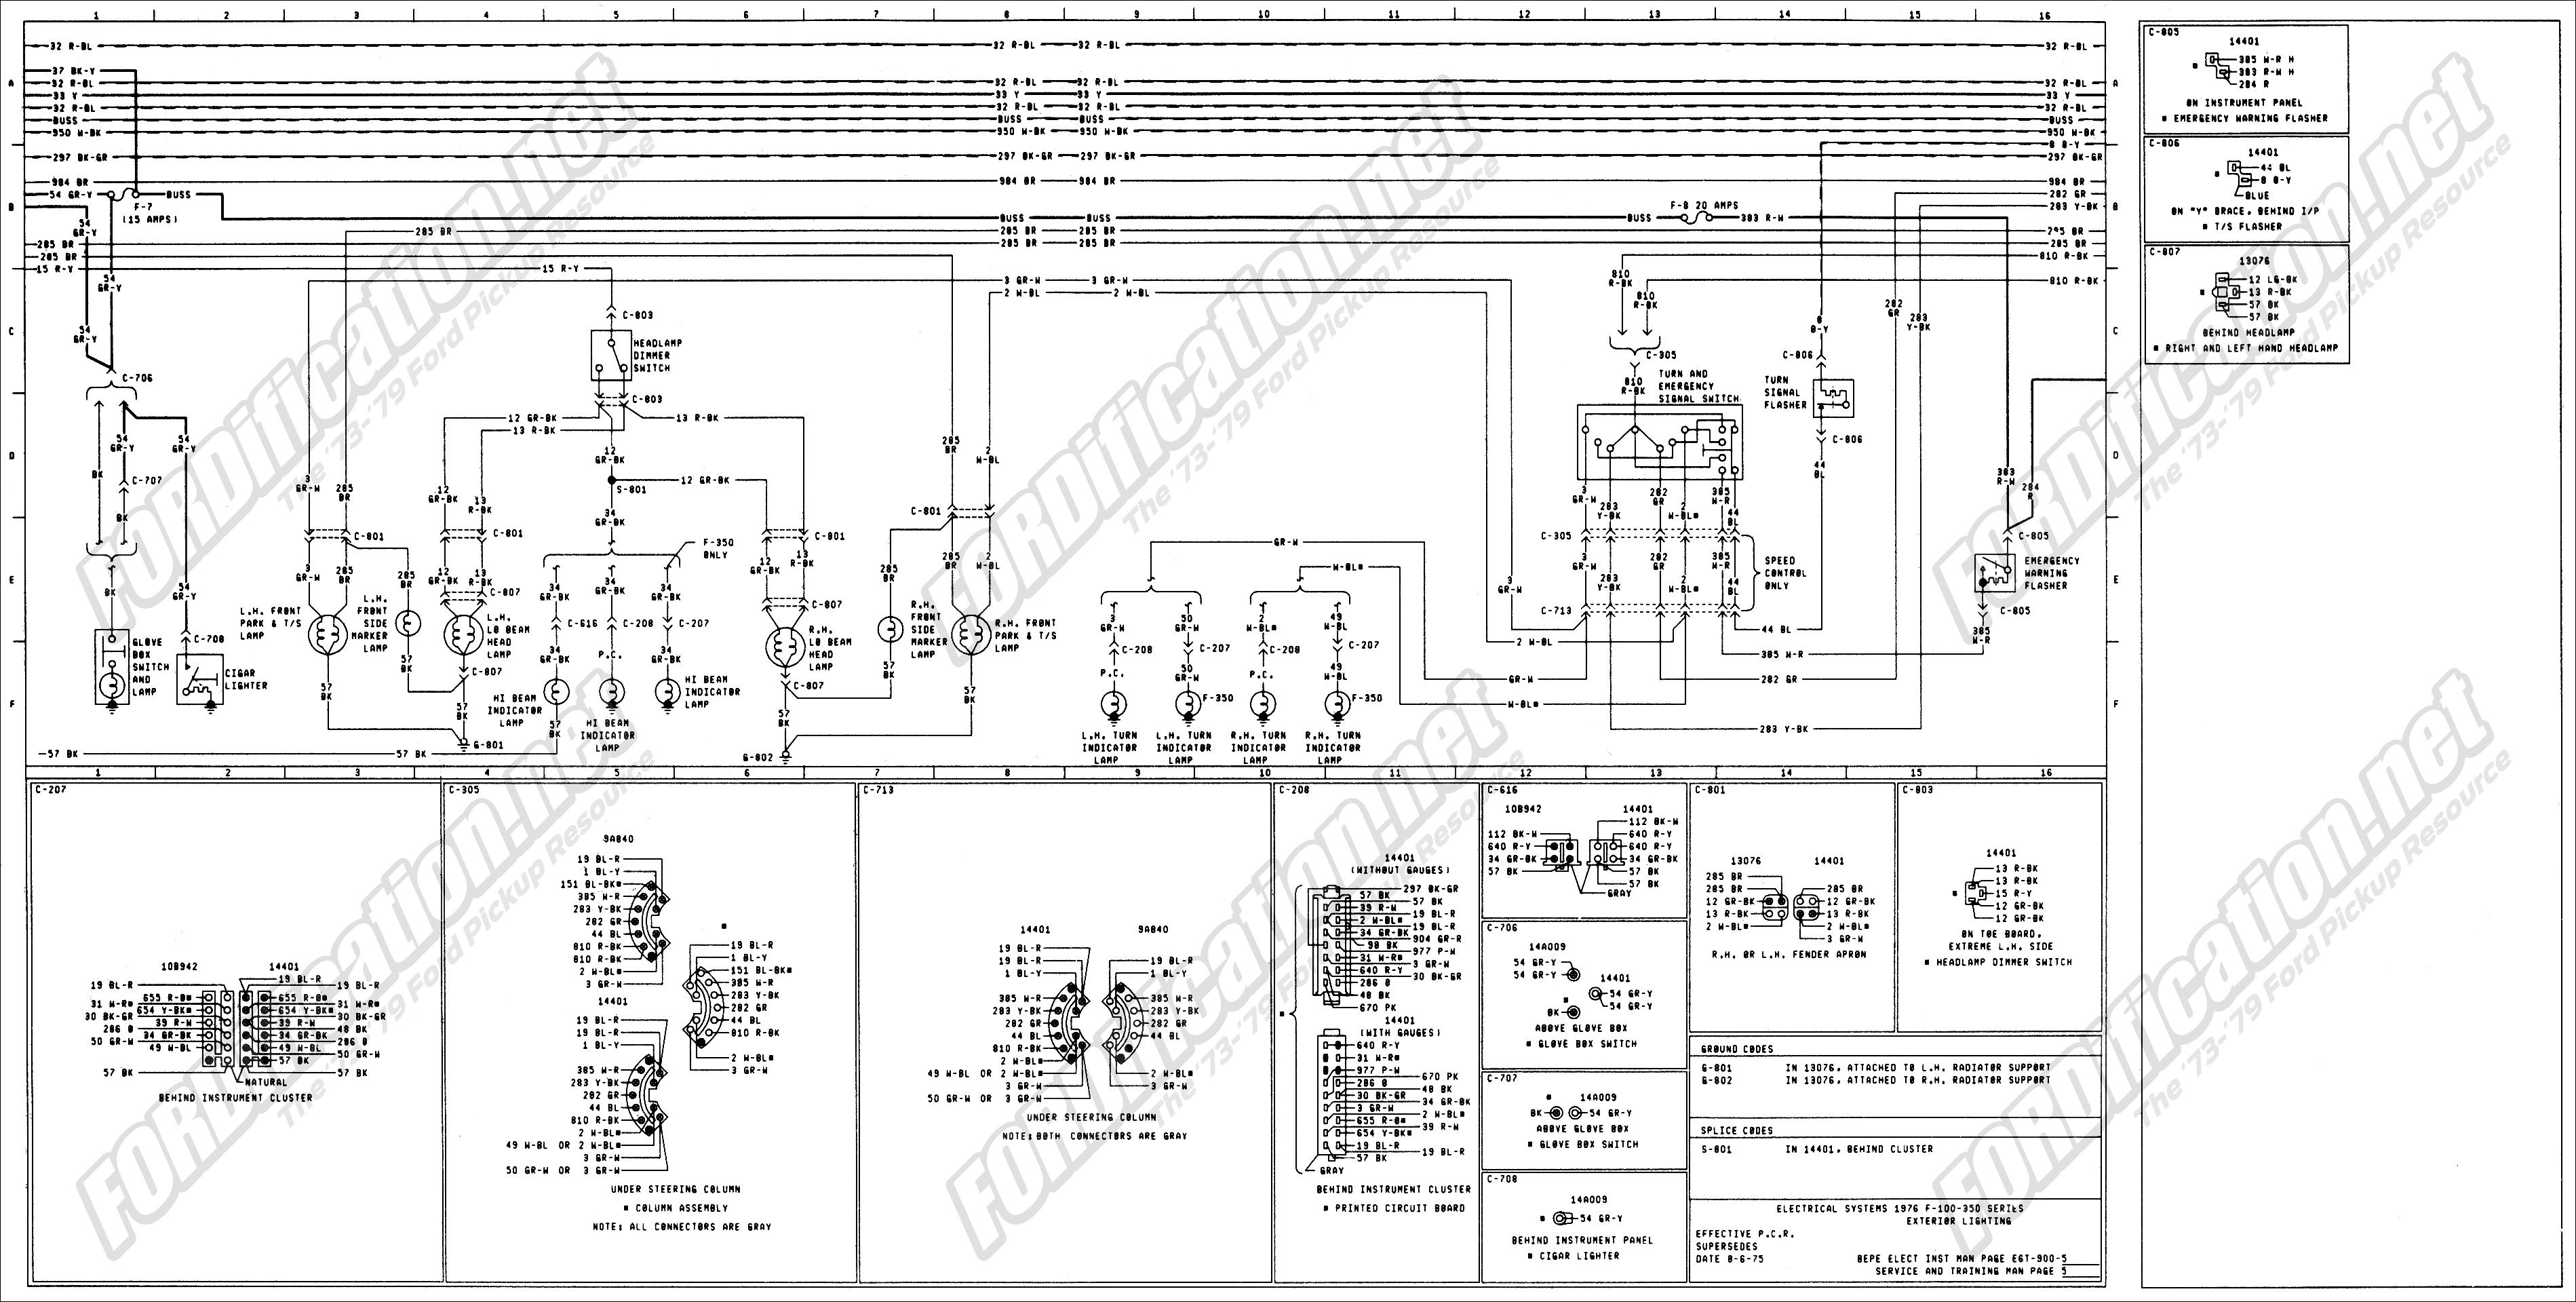 Awesome 1967 Ford F 250 Wiring Diagram Basic Electronics Wiring Diagram Wiring Cloud Ittabpendurdonanfuldomelitekicepsianuembamohammedshrineorg